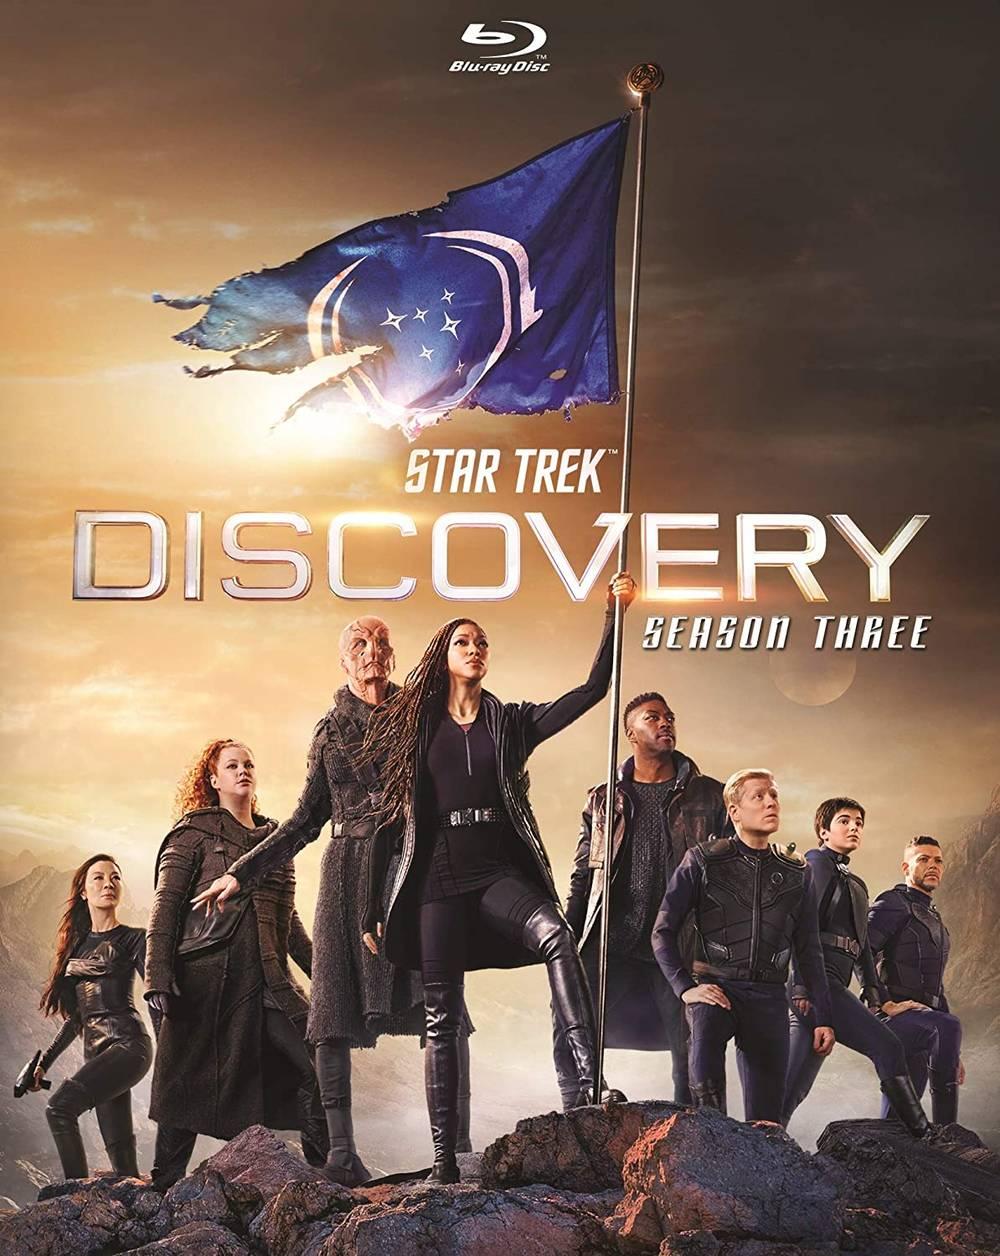 Star Trek: Discovery [TV Series] - Star Trek Discovery: Season Three